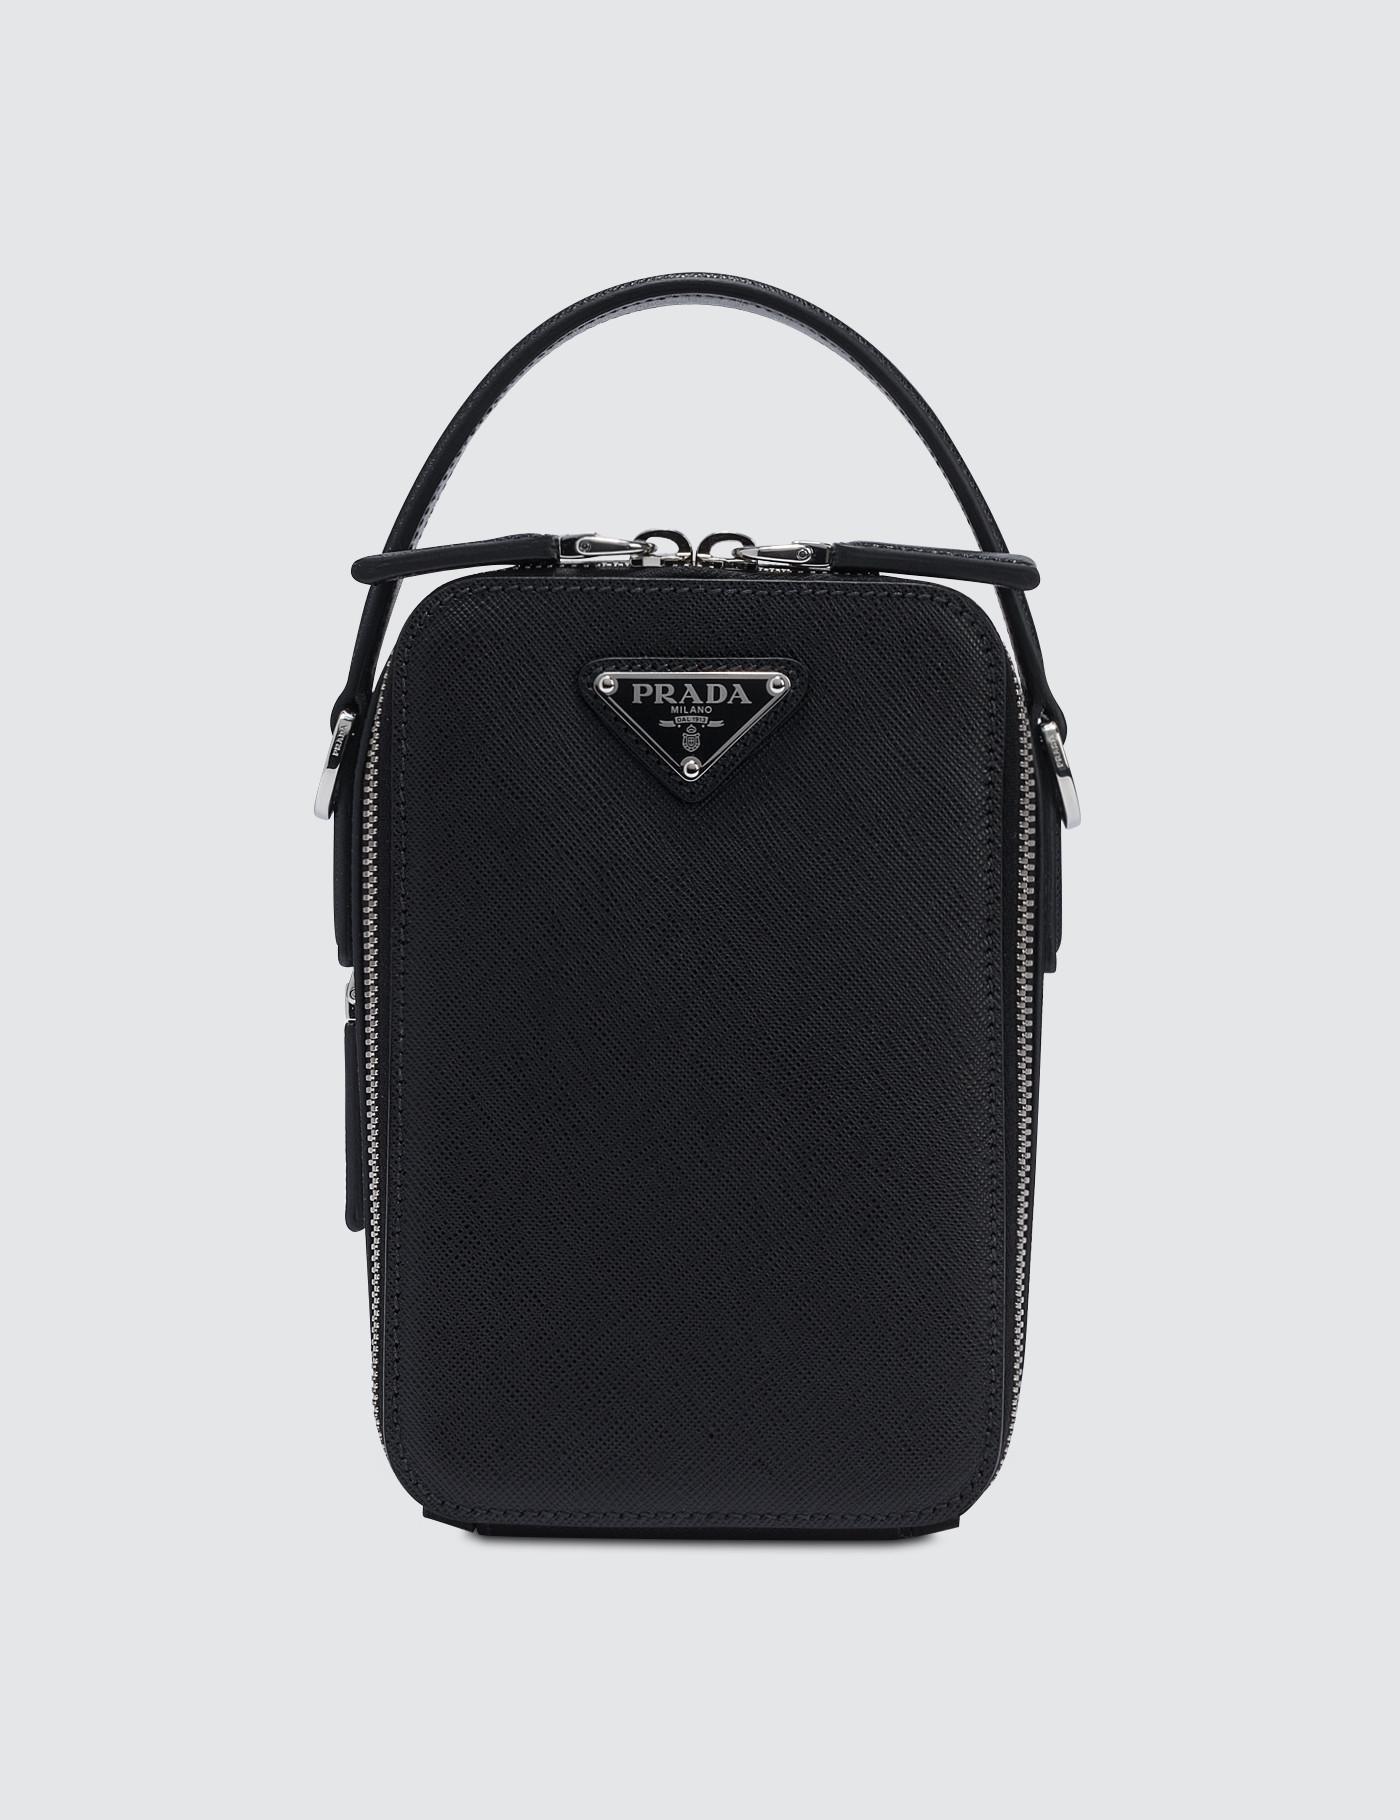 Prada Cross Body Bag in Black for Men - Save 7% - Lyst b10b698469bd7